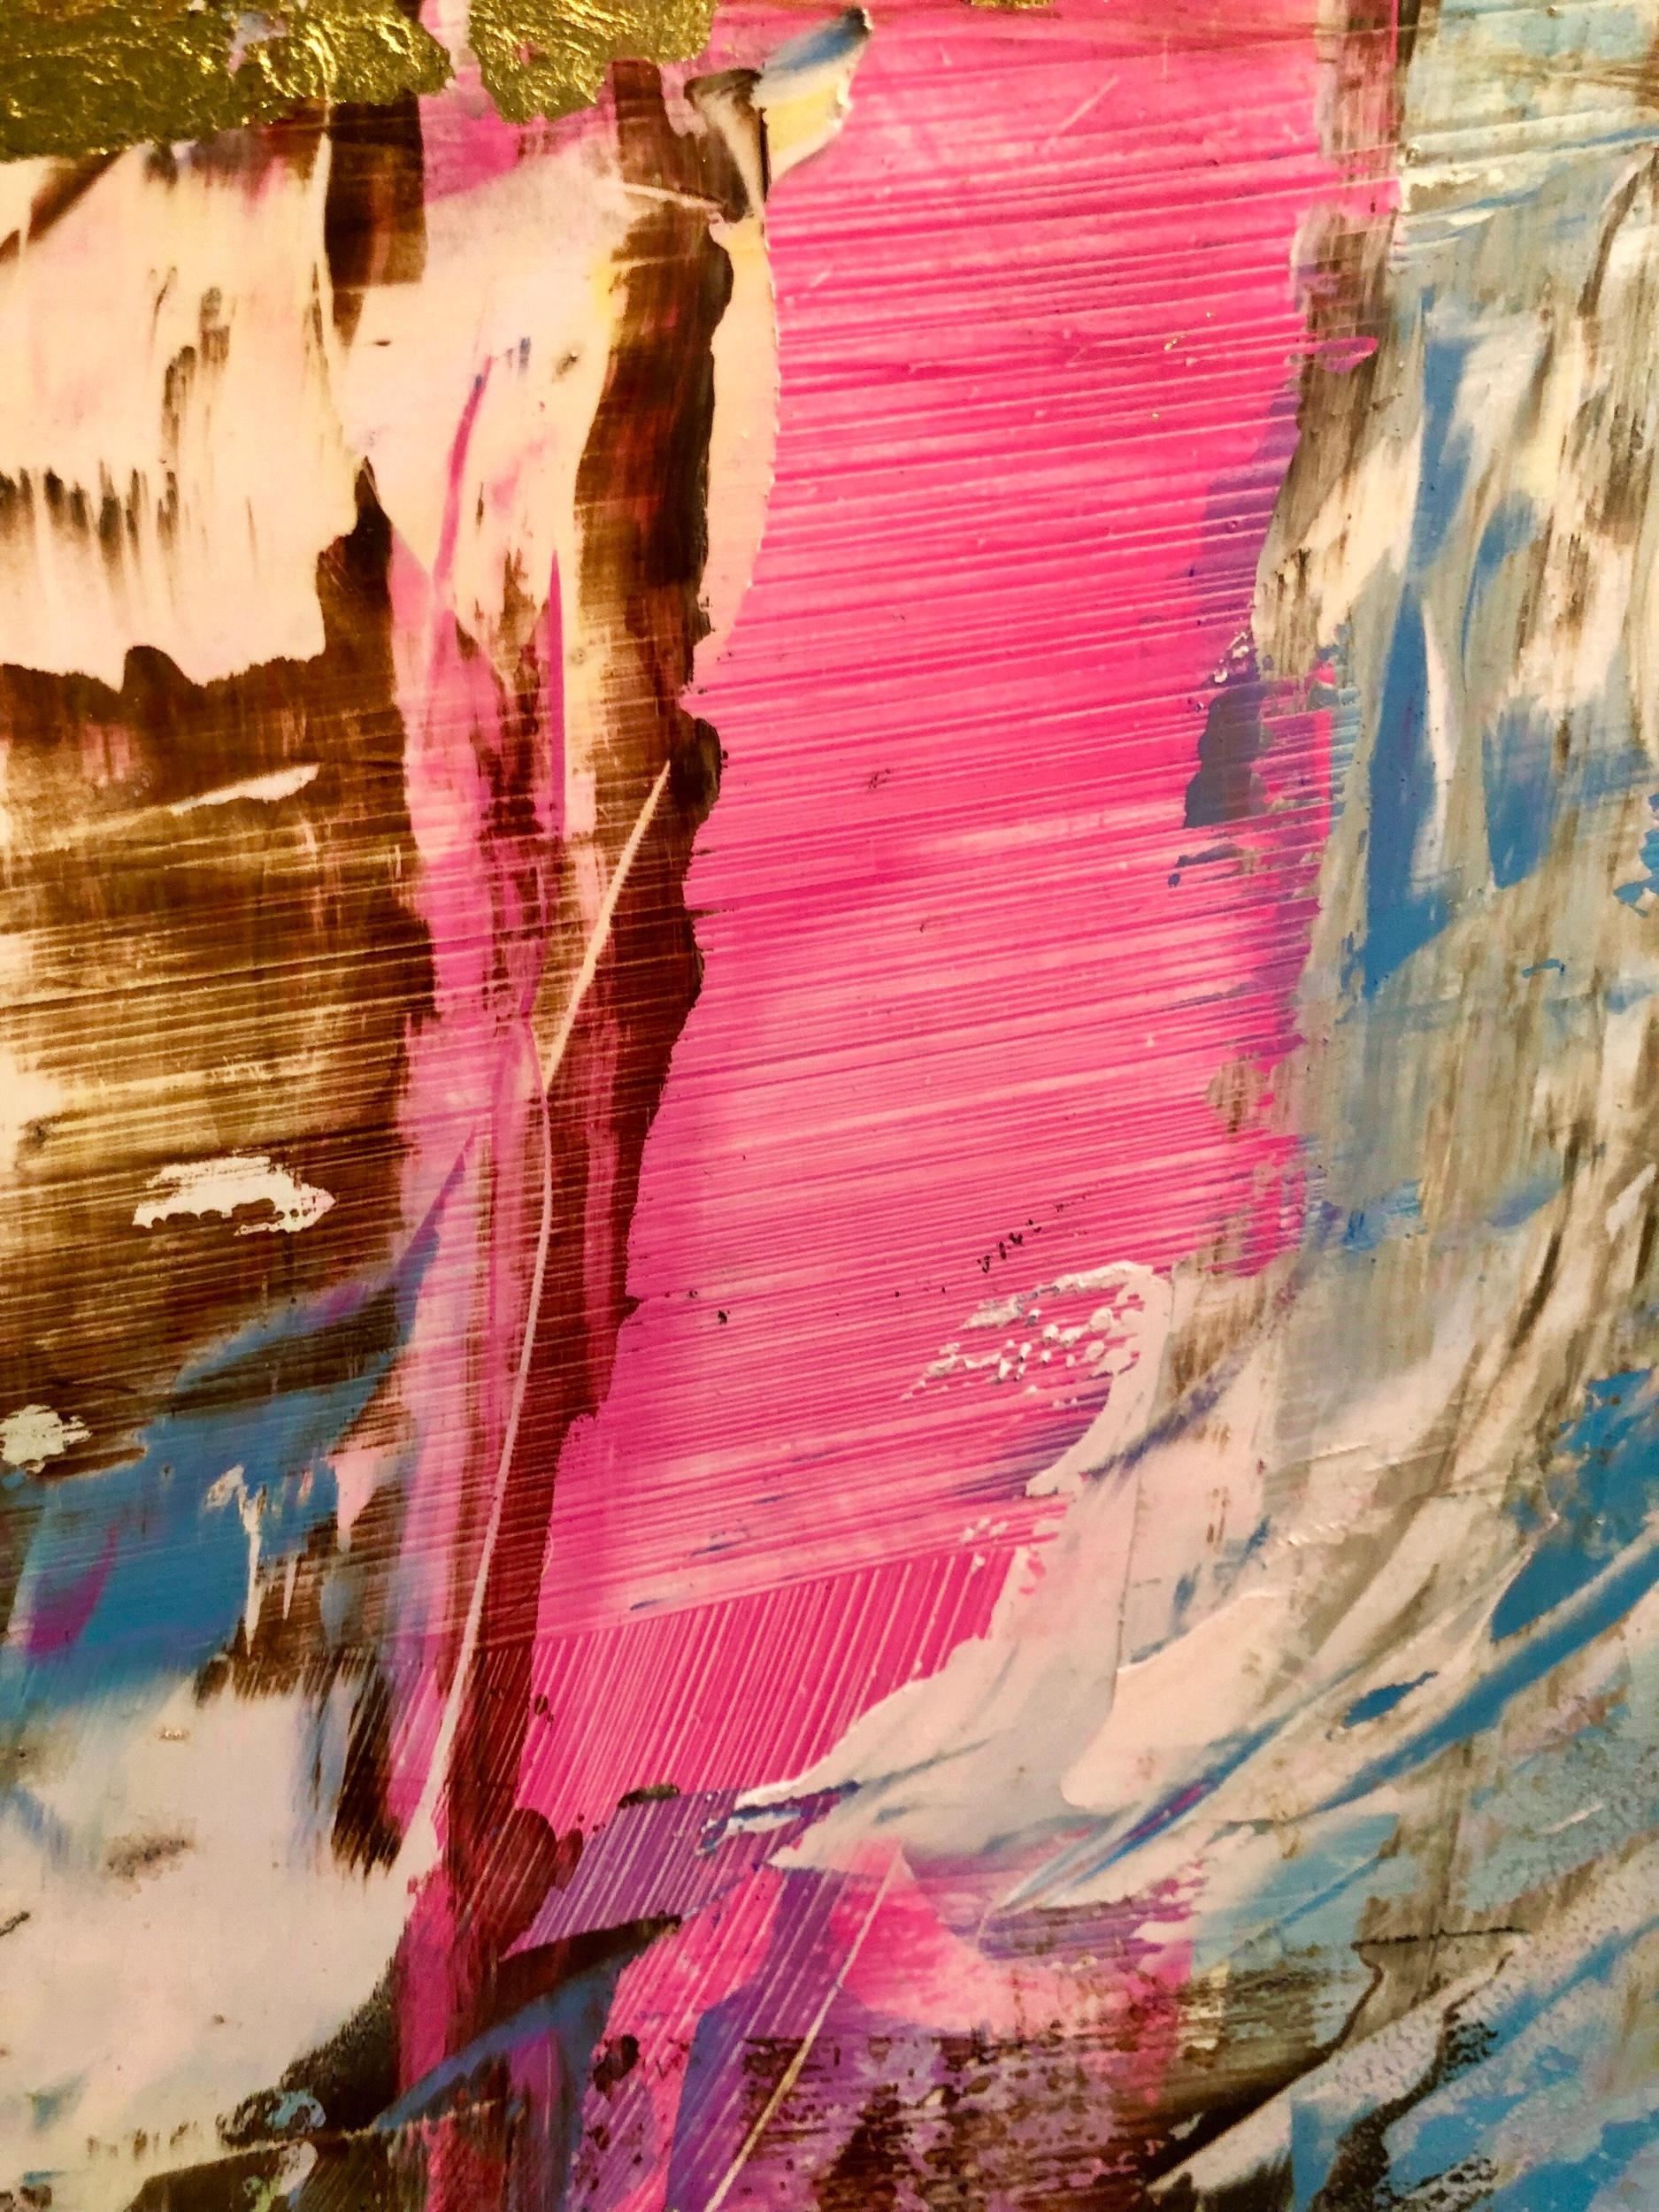 Pulsating pink